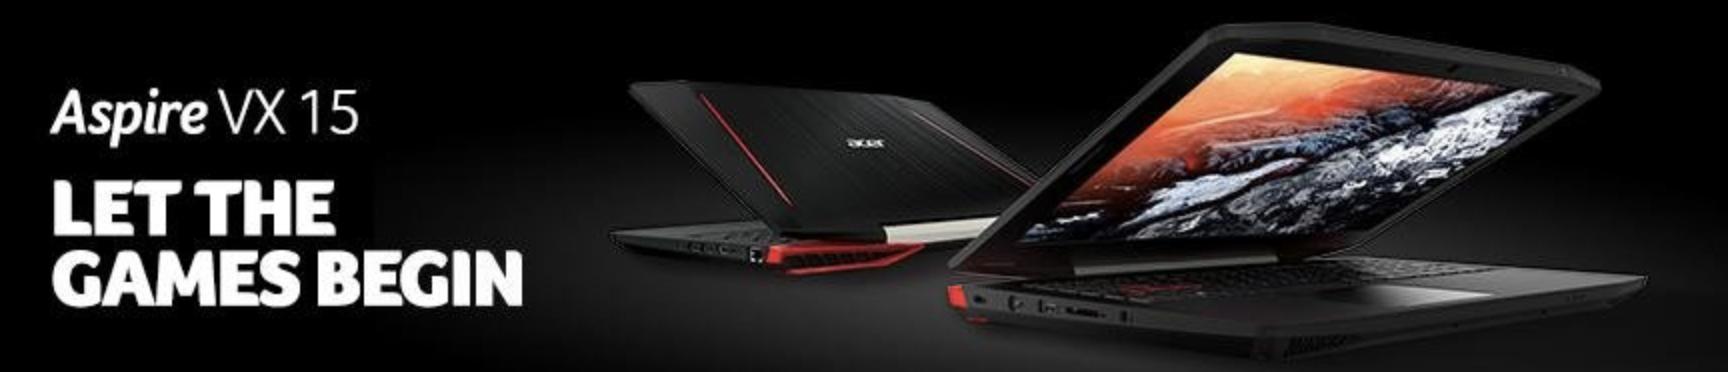 vx15-keyboard-key-banner.jpg